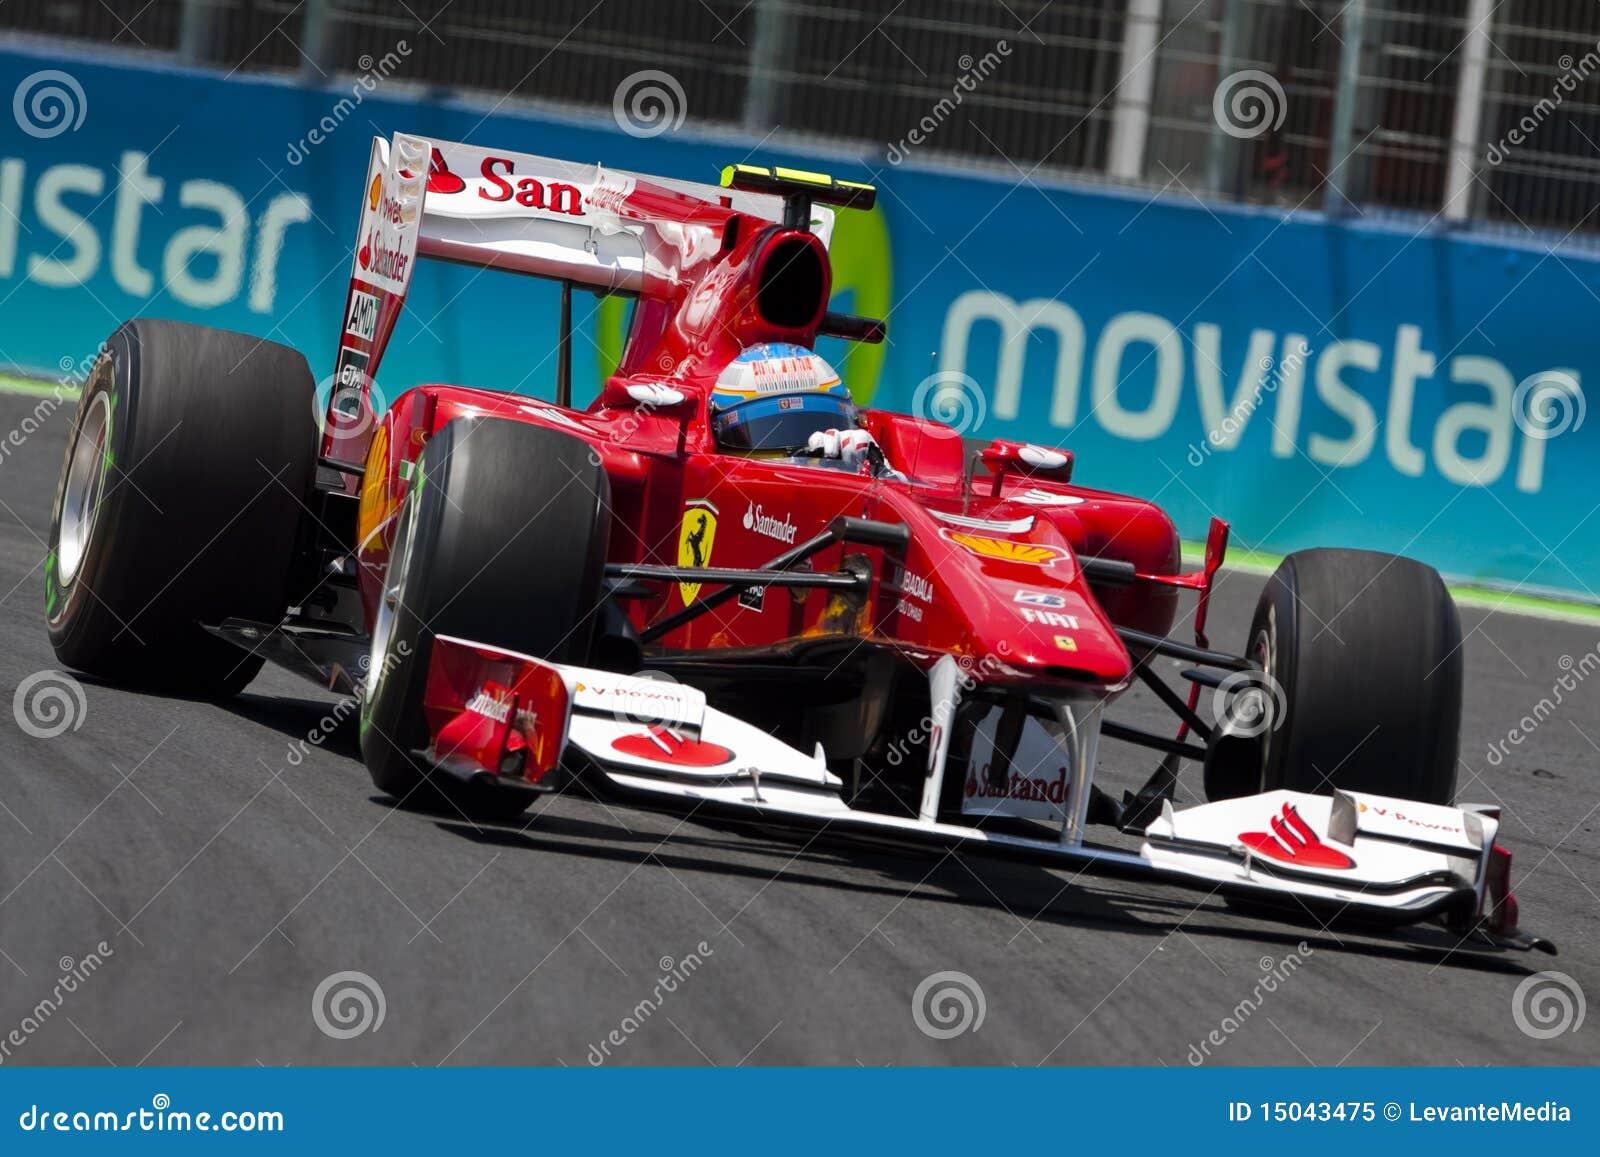 F1 Valencia Street Circuit 2010